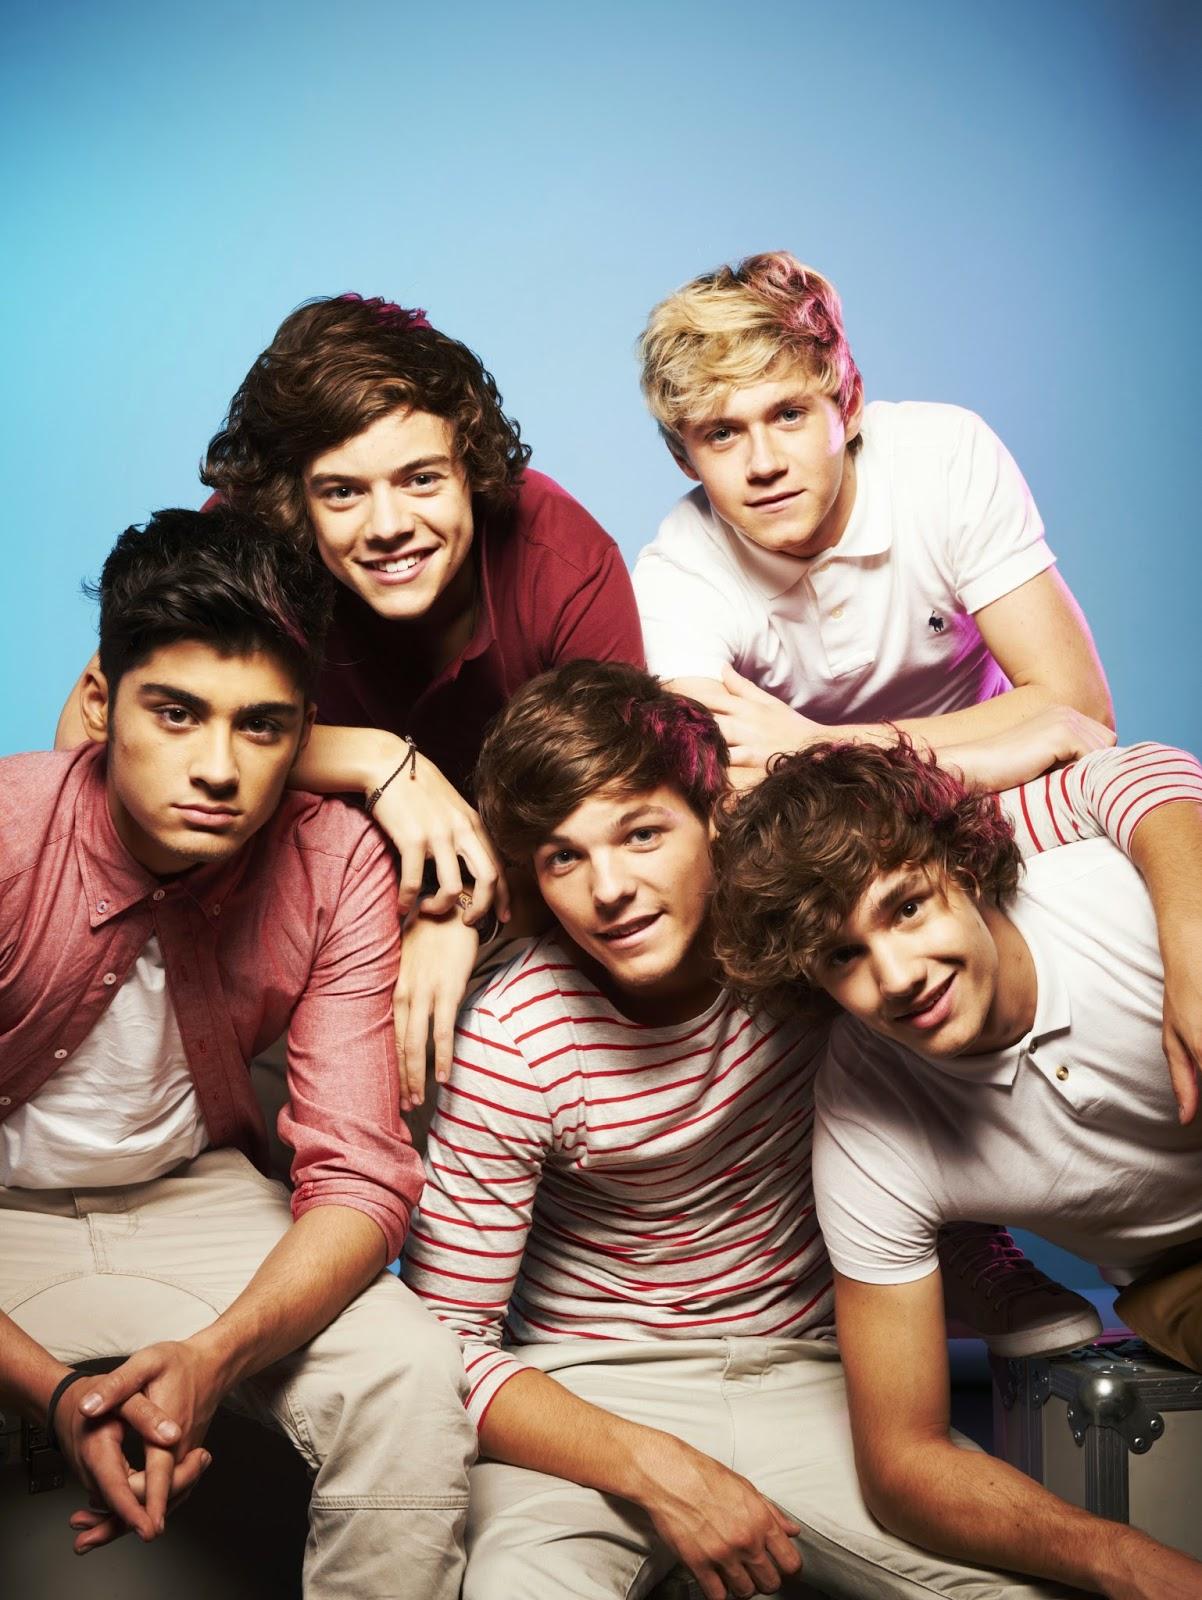 Zayn Malik Tumblr 2014 One Direction Nederlan...